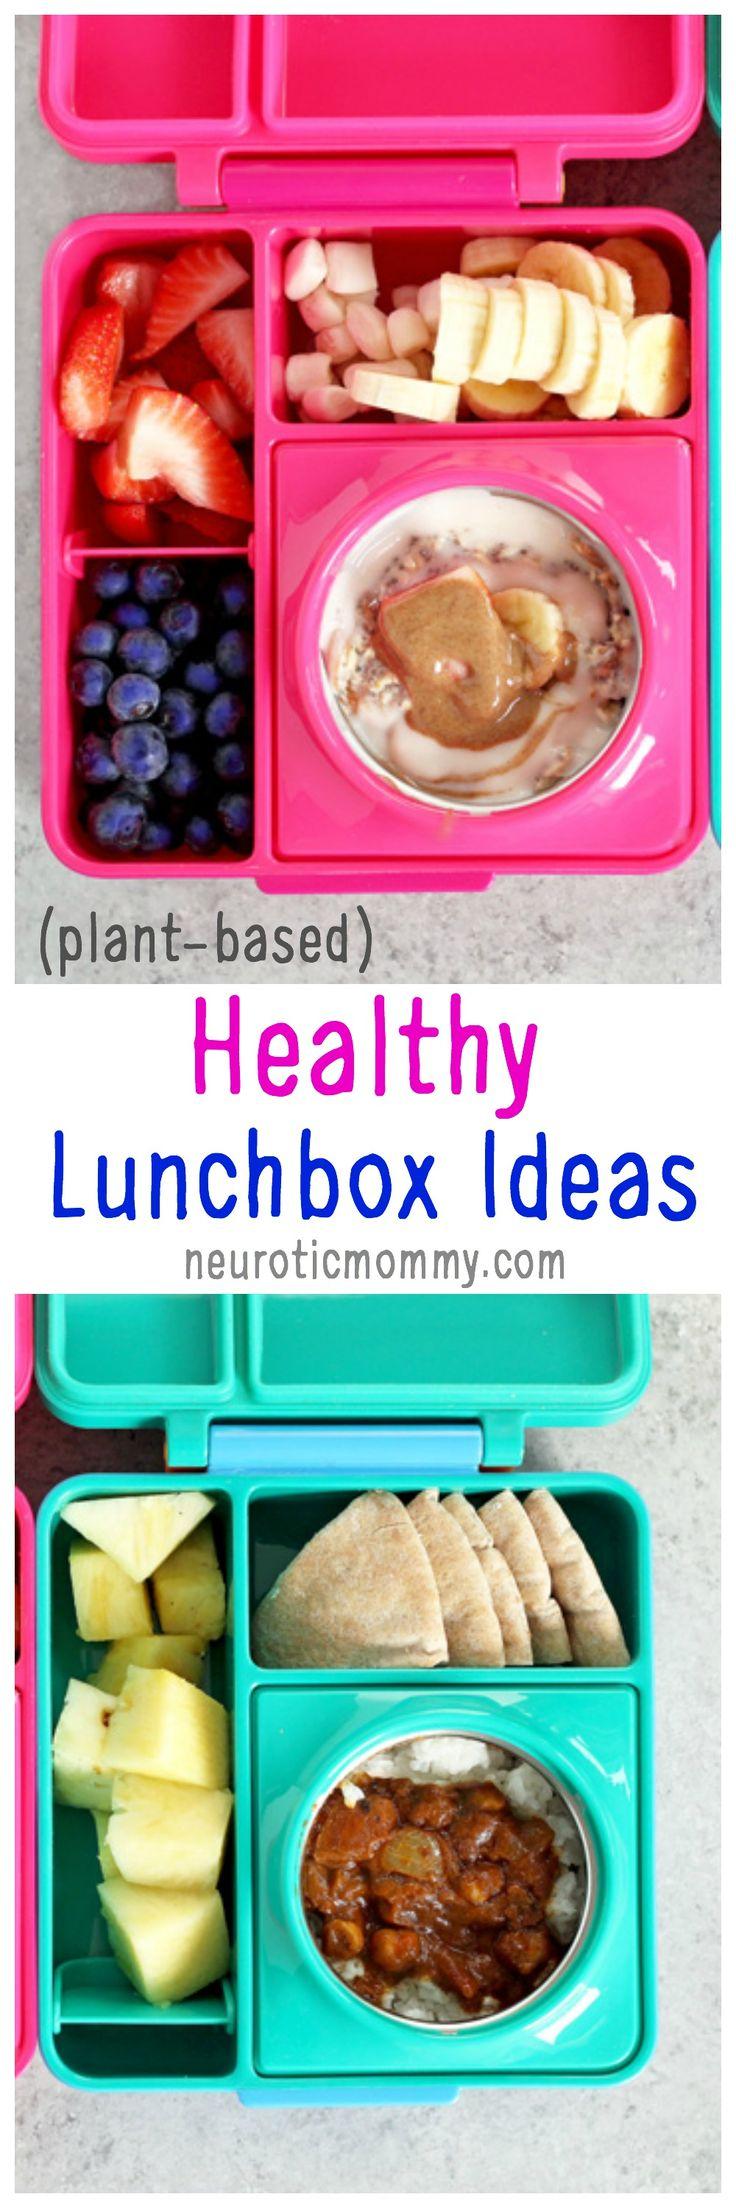 best 25 hot school lunch ideas on pinterest kids school lunch ideas thermos lunch ideas and. Black Bedroom Furniture Sets. Home Design Ideas